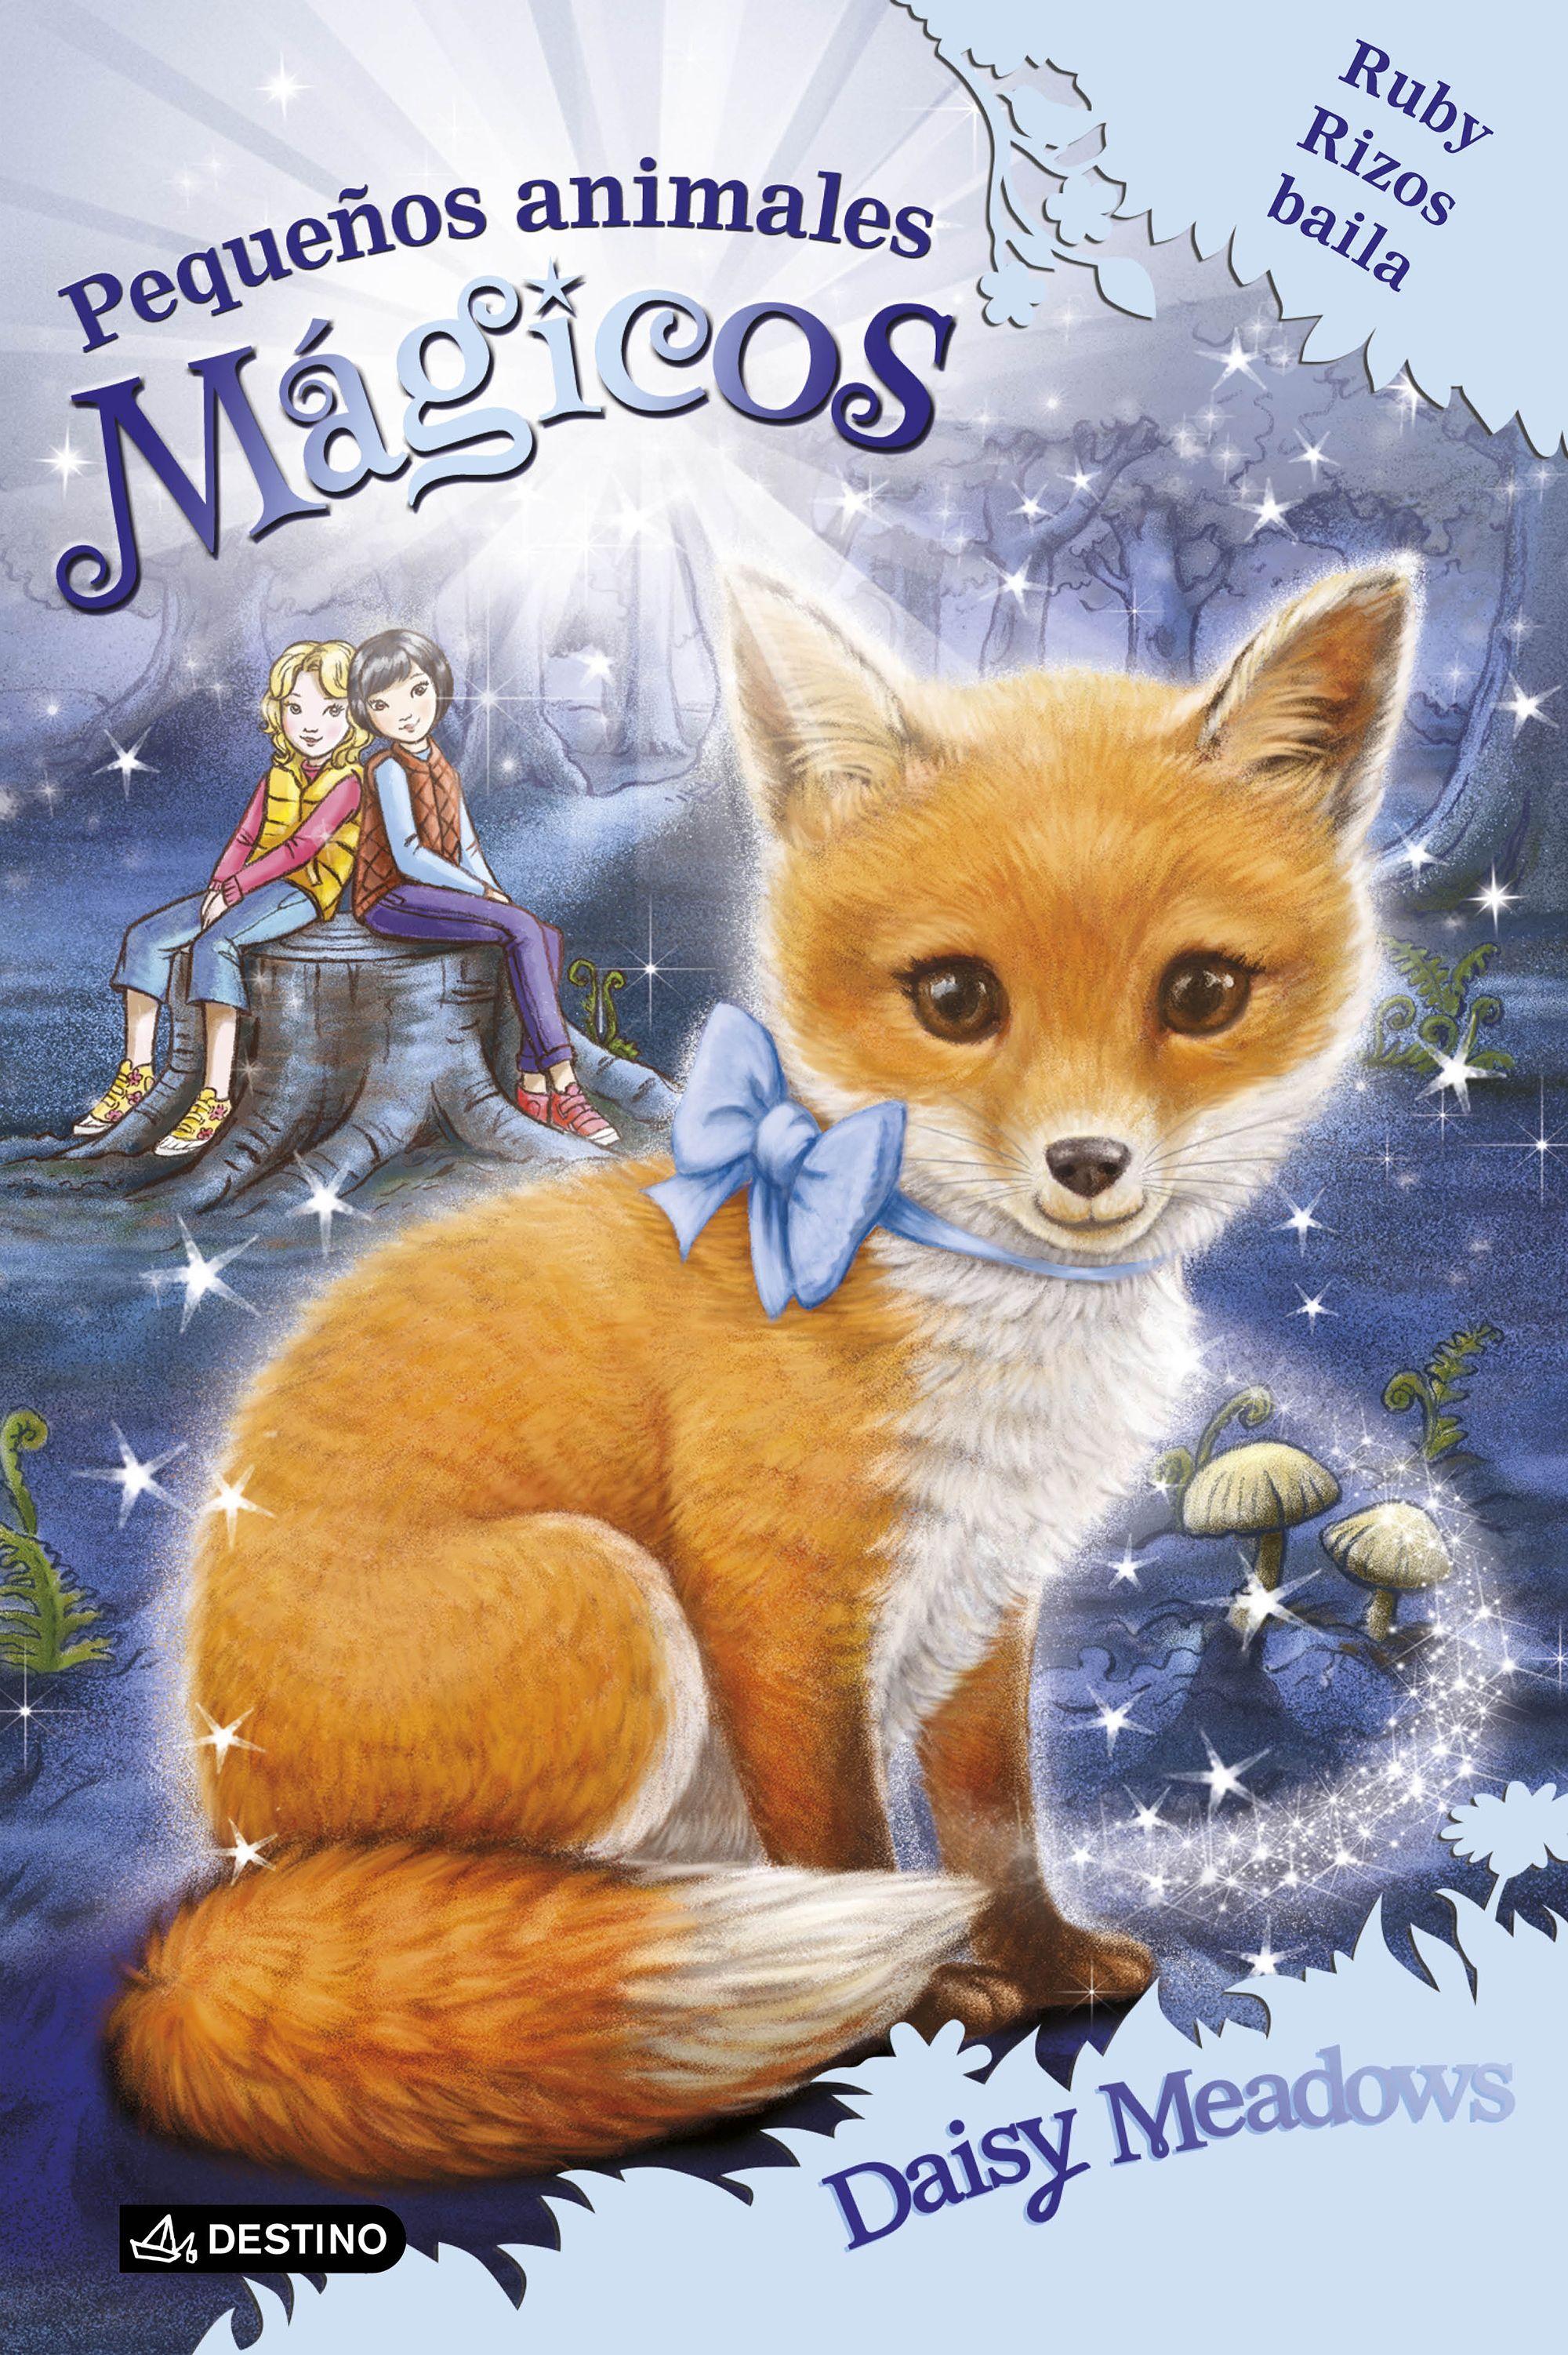 Pequeños Animales Magicos 7: Ruby Rizos Baila por Daisy Meadows